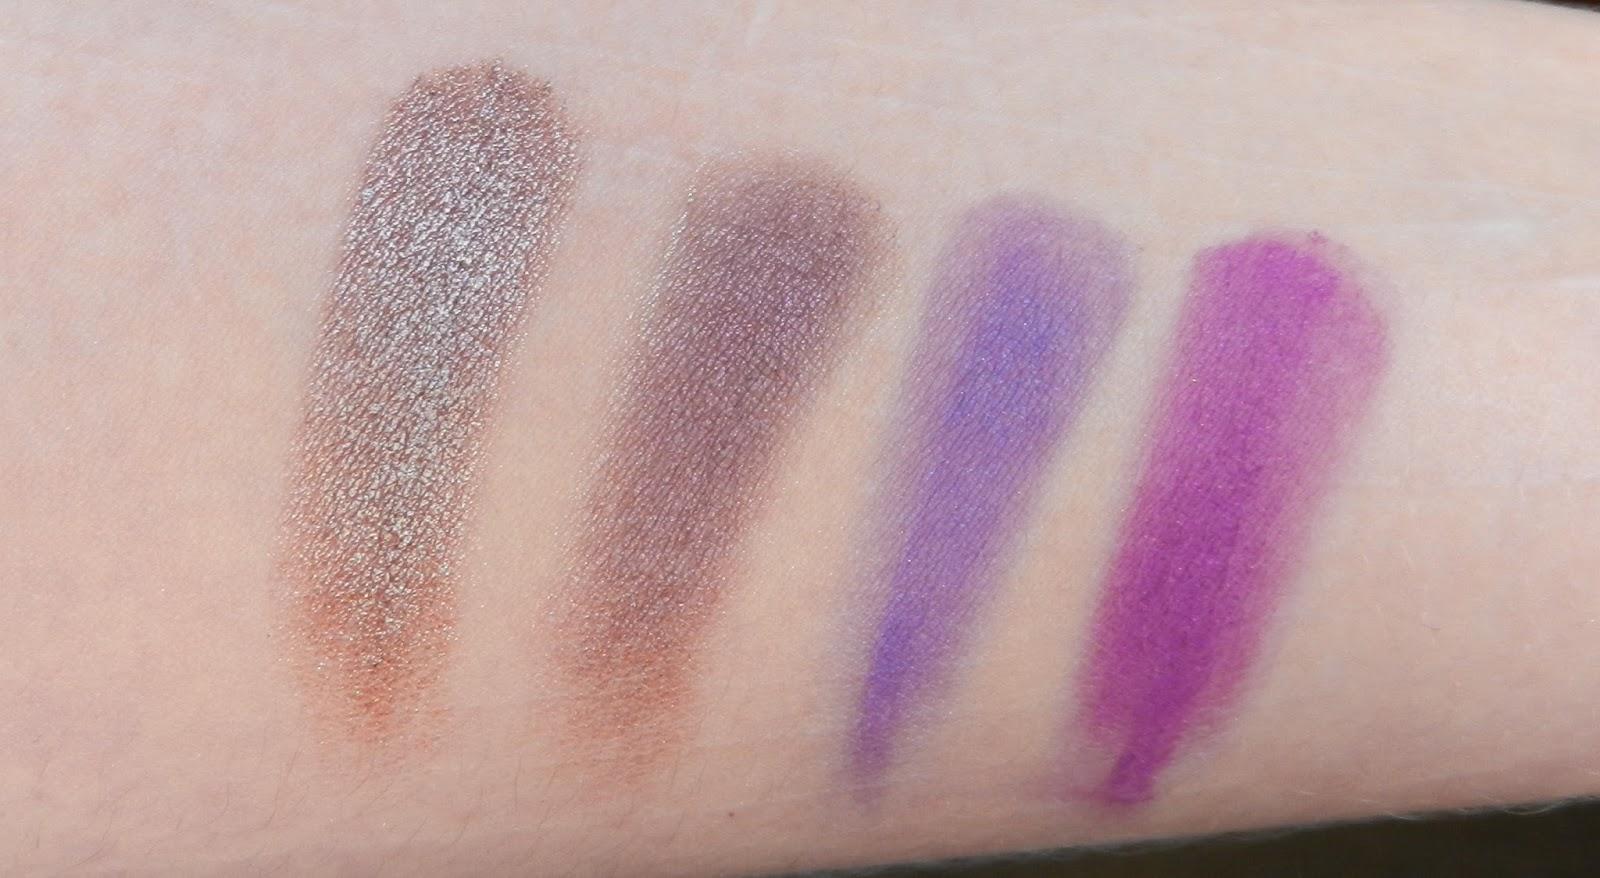 Natasha Denona Palette 28 Blue 49M Vintage, 23P Smoky Plum, 28V Electric Violet, 82V Nina's Orchid